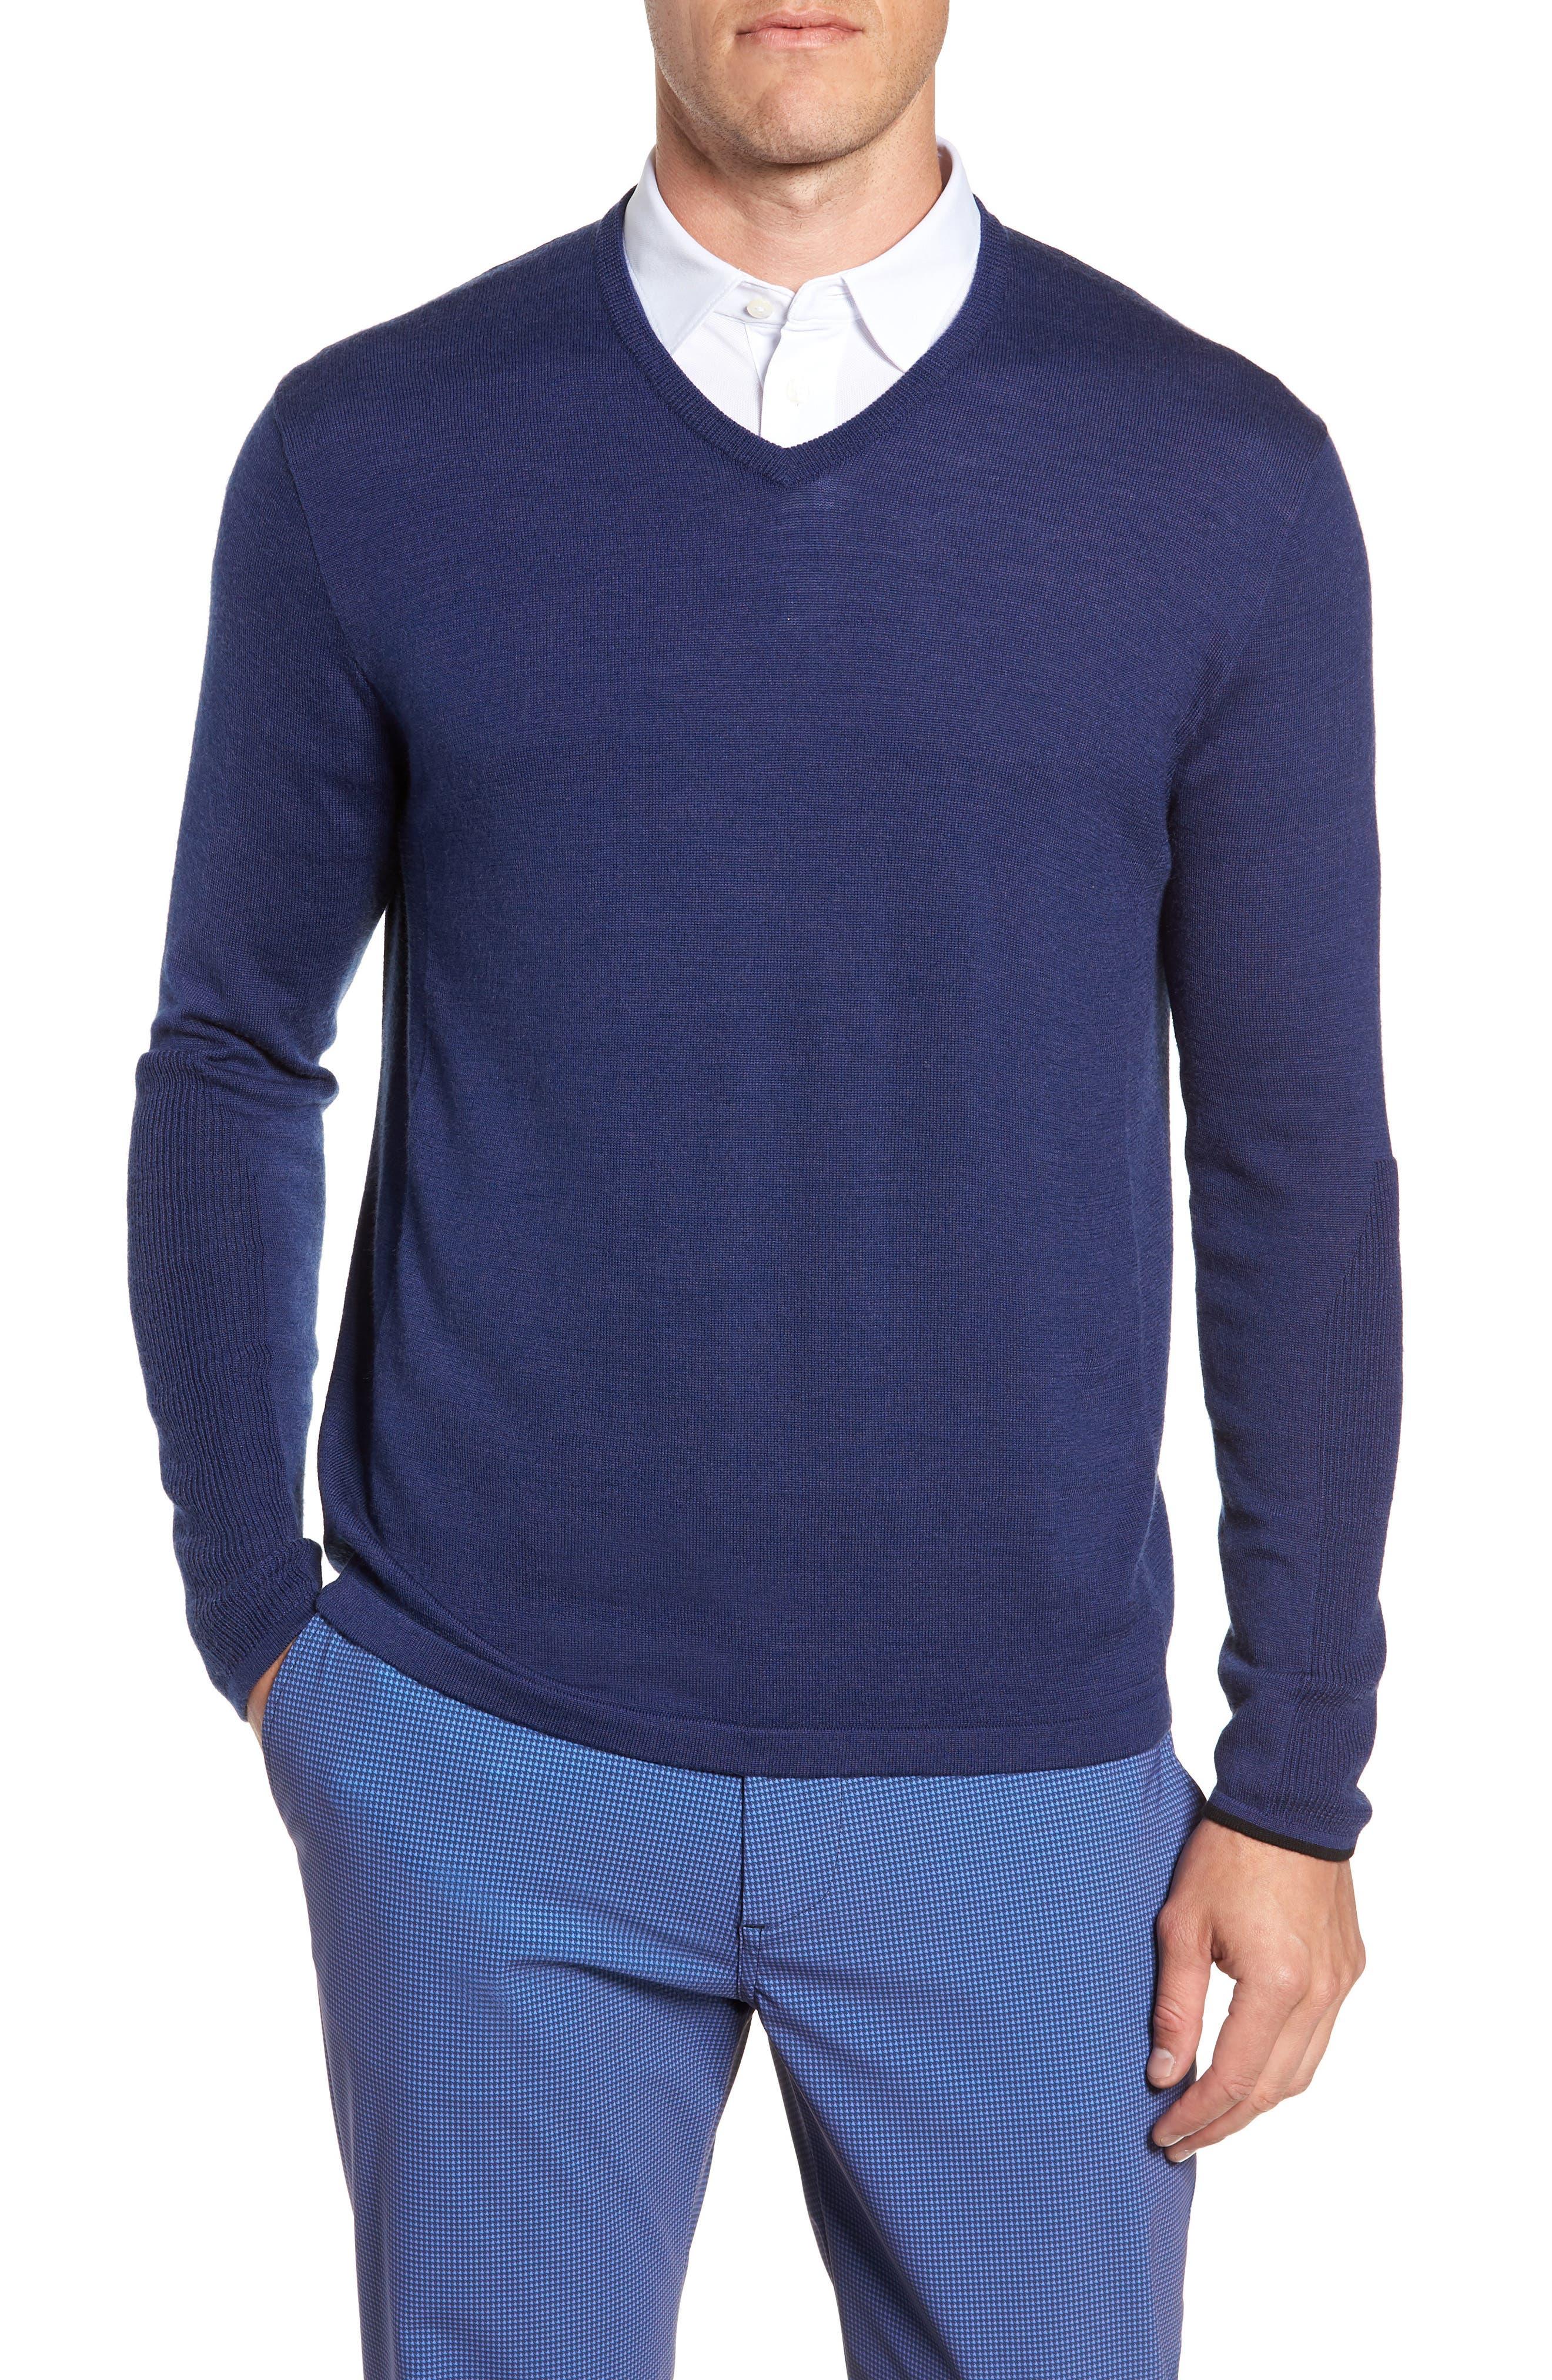 Greyson Guide Merino Wool Blend V-Neck Sweater, Blue